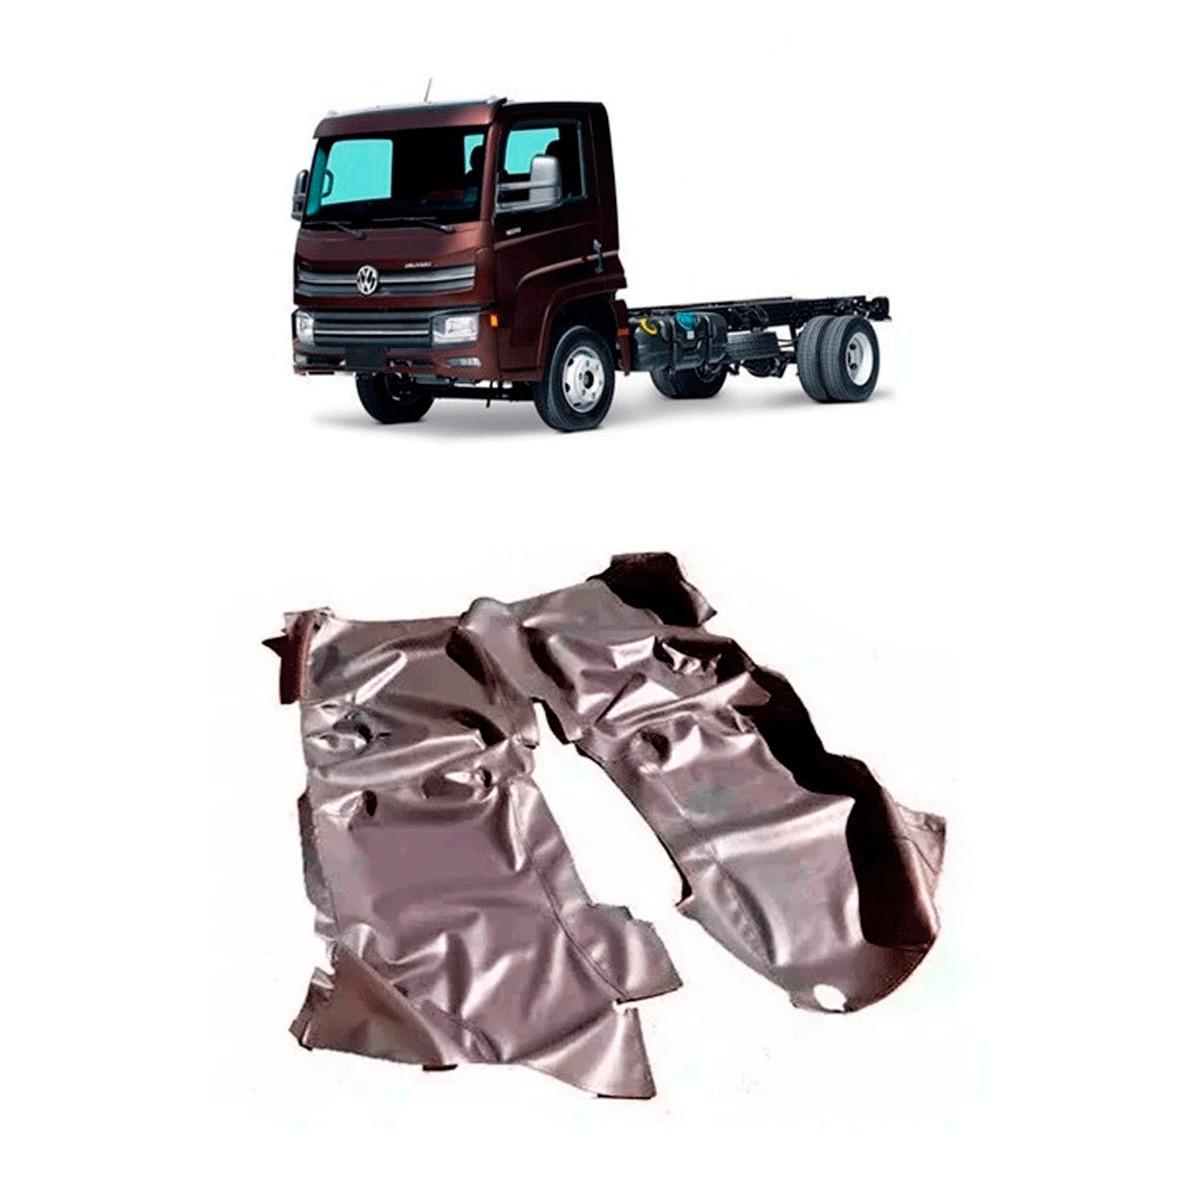 Tapete Automotivo Para Caminhão Volkswagen Delivery 9.170/ 11.180 2017-2020 Preto